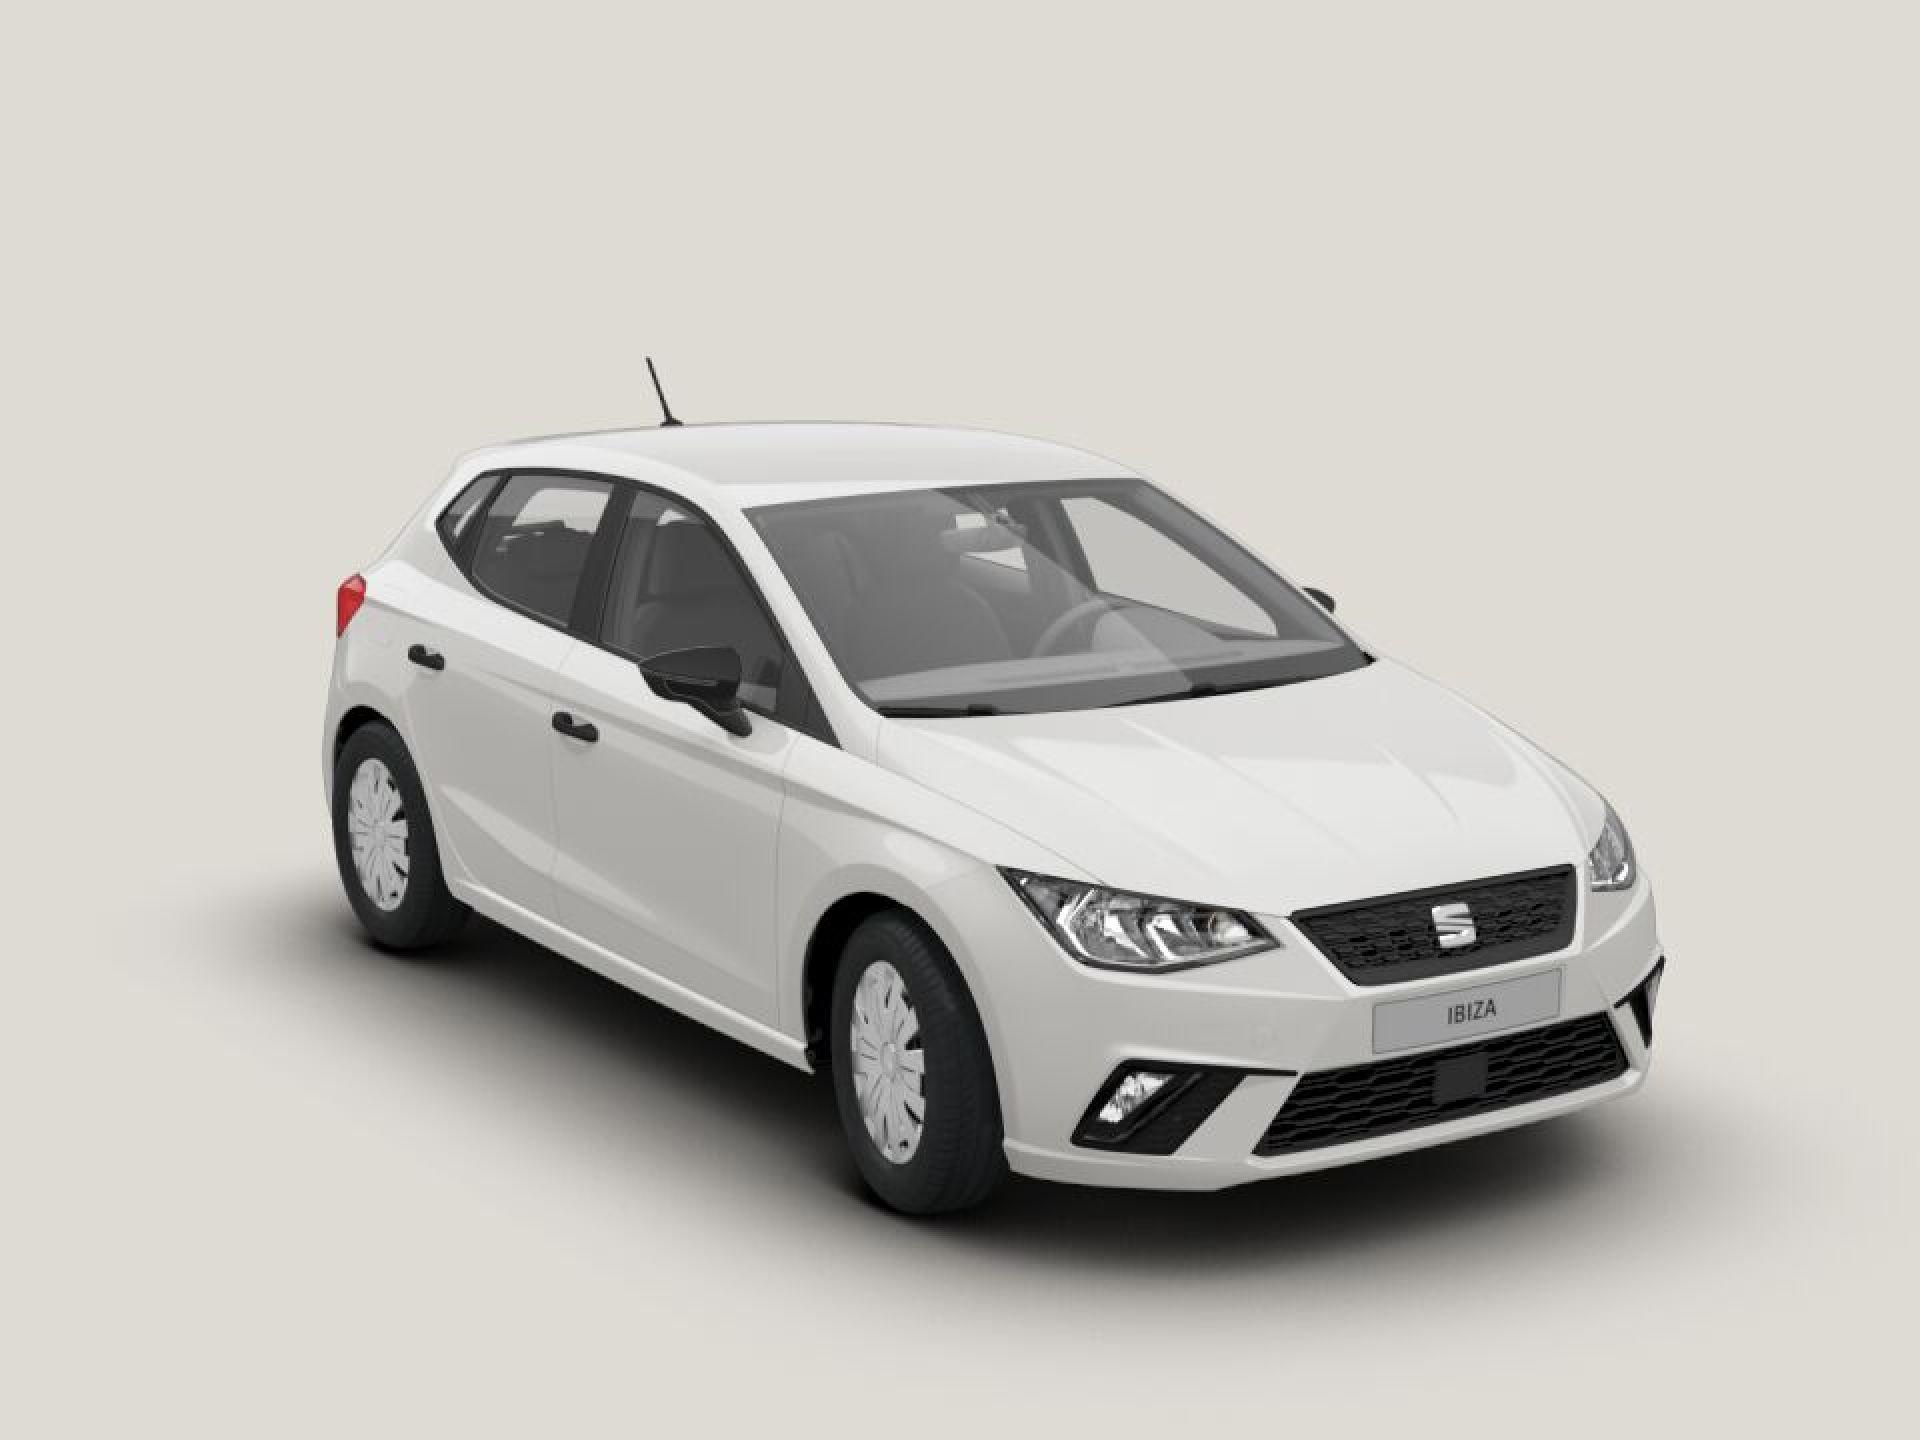 SEAT Ibiza 1.0 TGI 66kW (90CV) Reference Plus nuevo Madrid